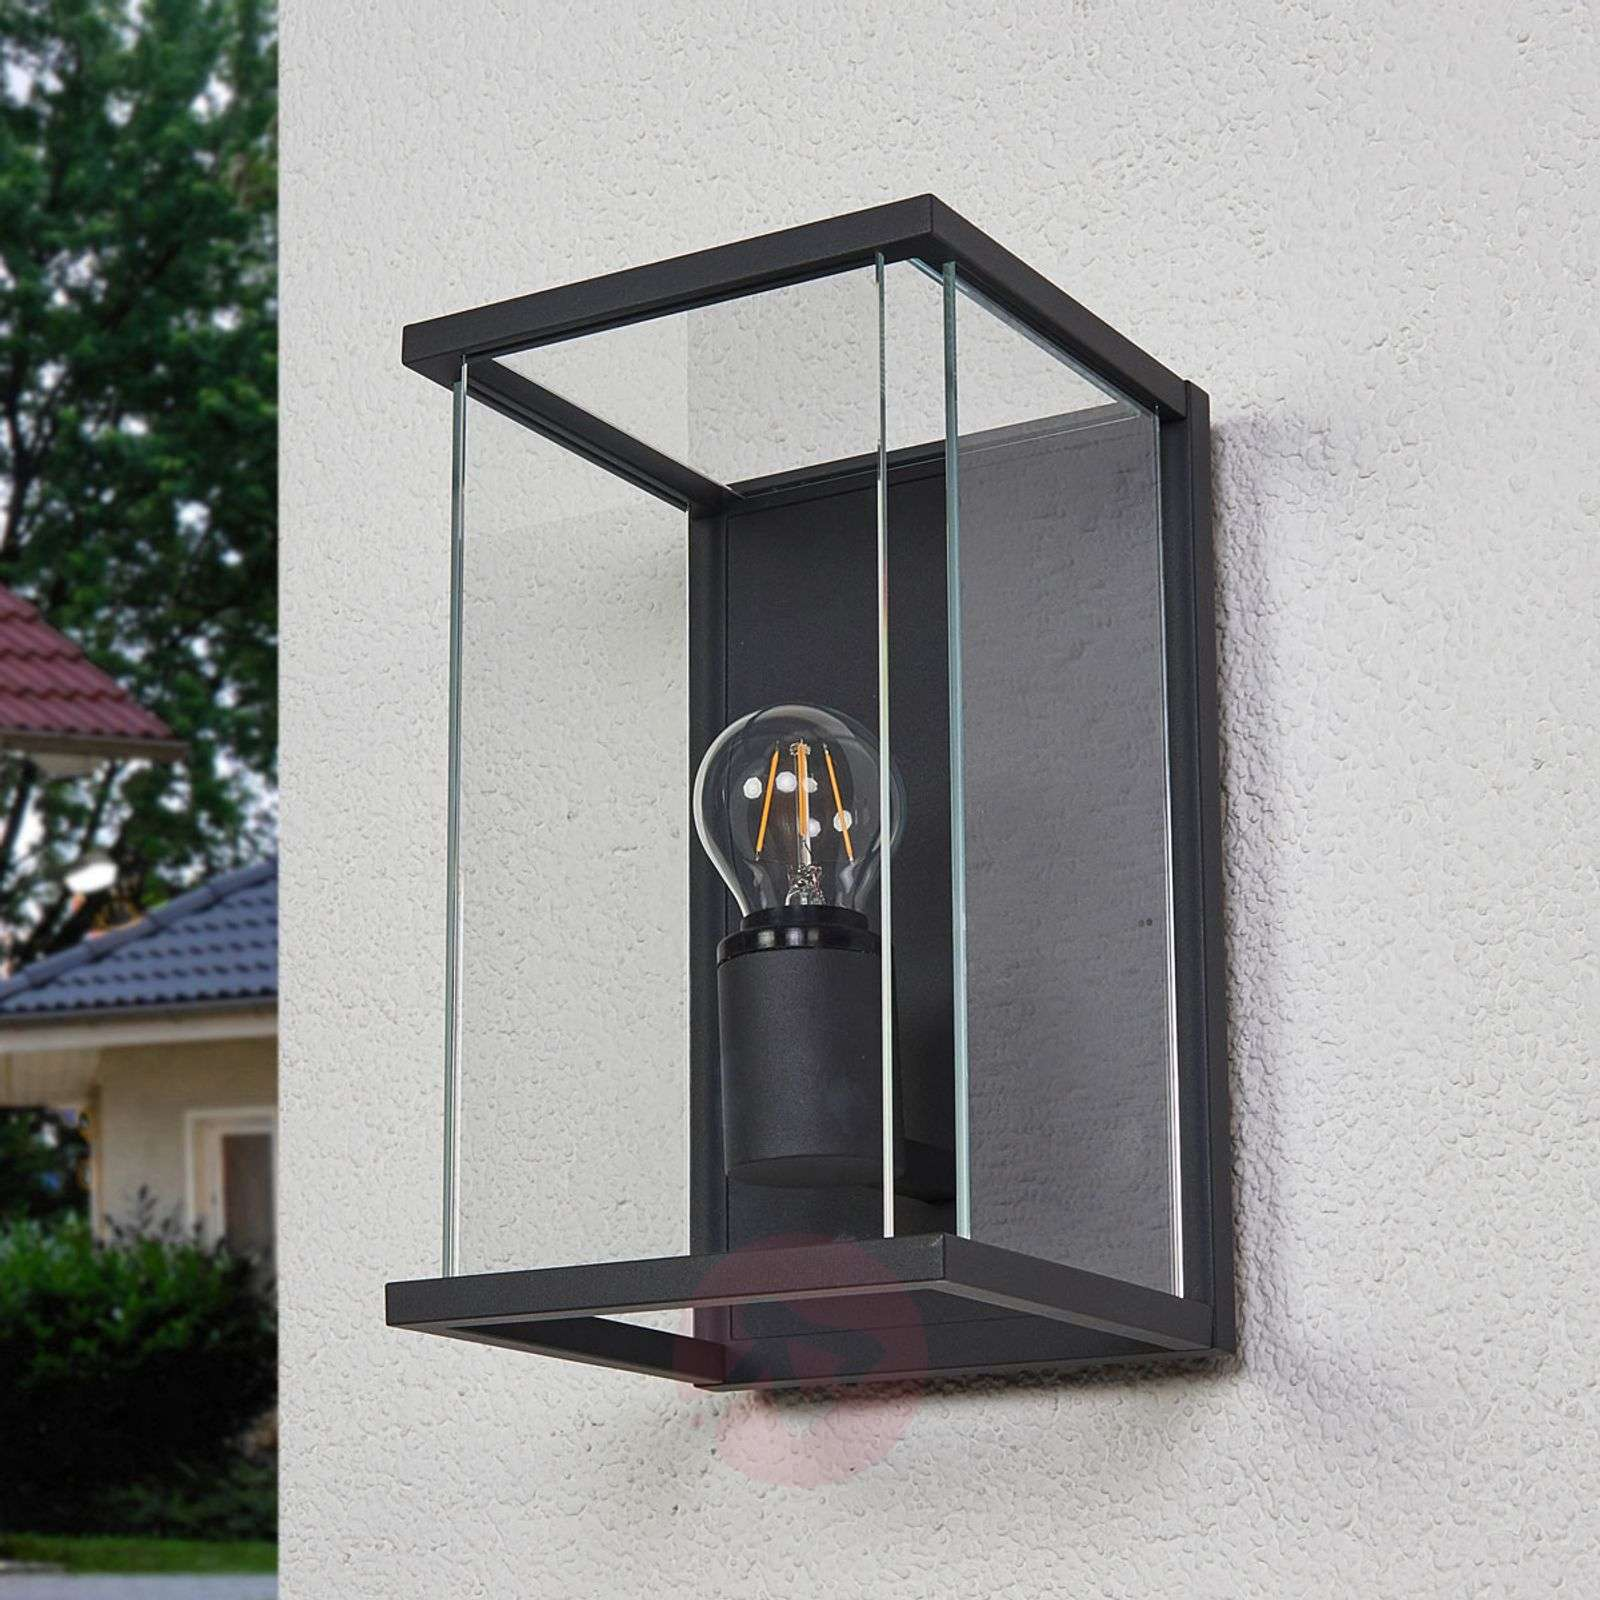 IP54 outdoor wall light Annalea, glass lampshade-9616099-02